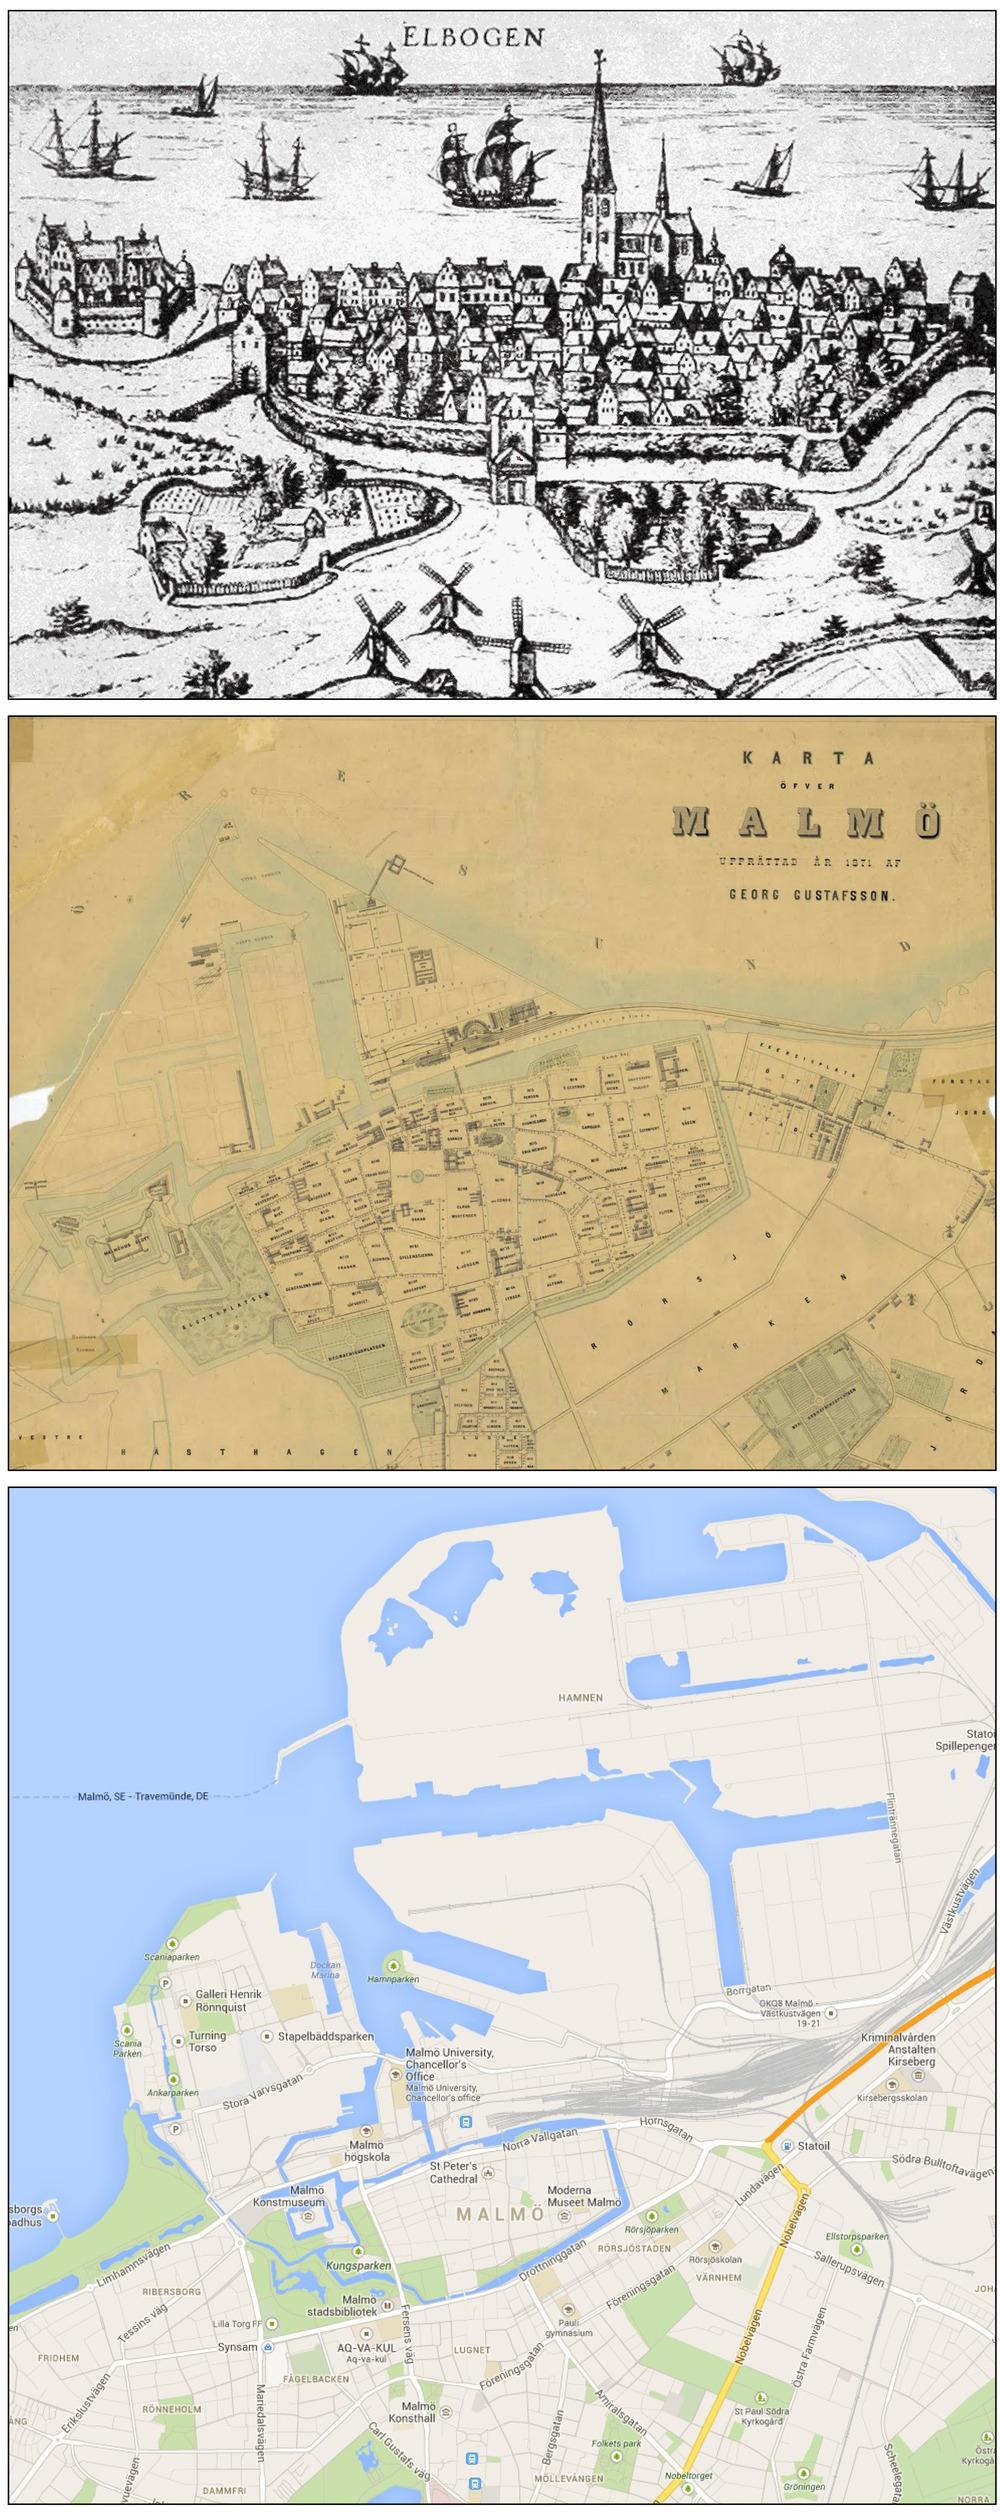 Malmo maps.jpg